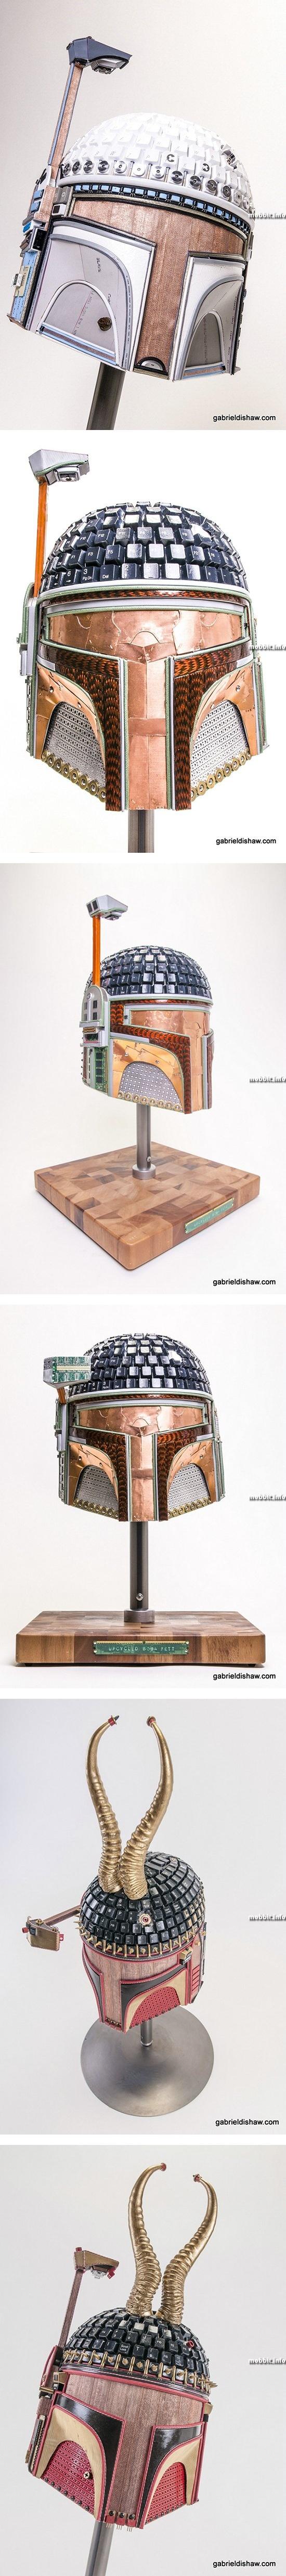 Шлемы Боба Фетта из старой электроники